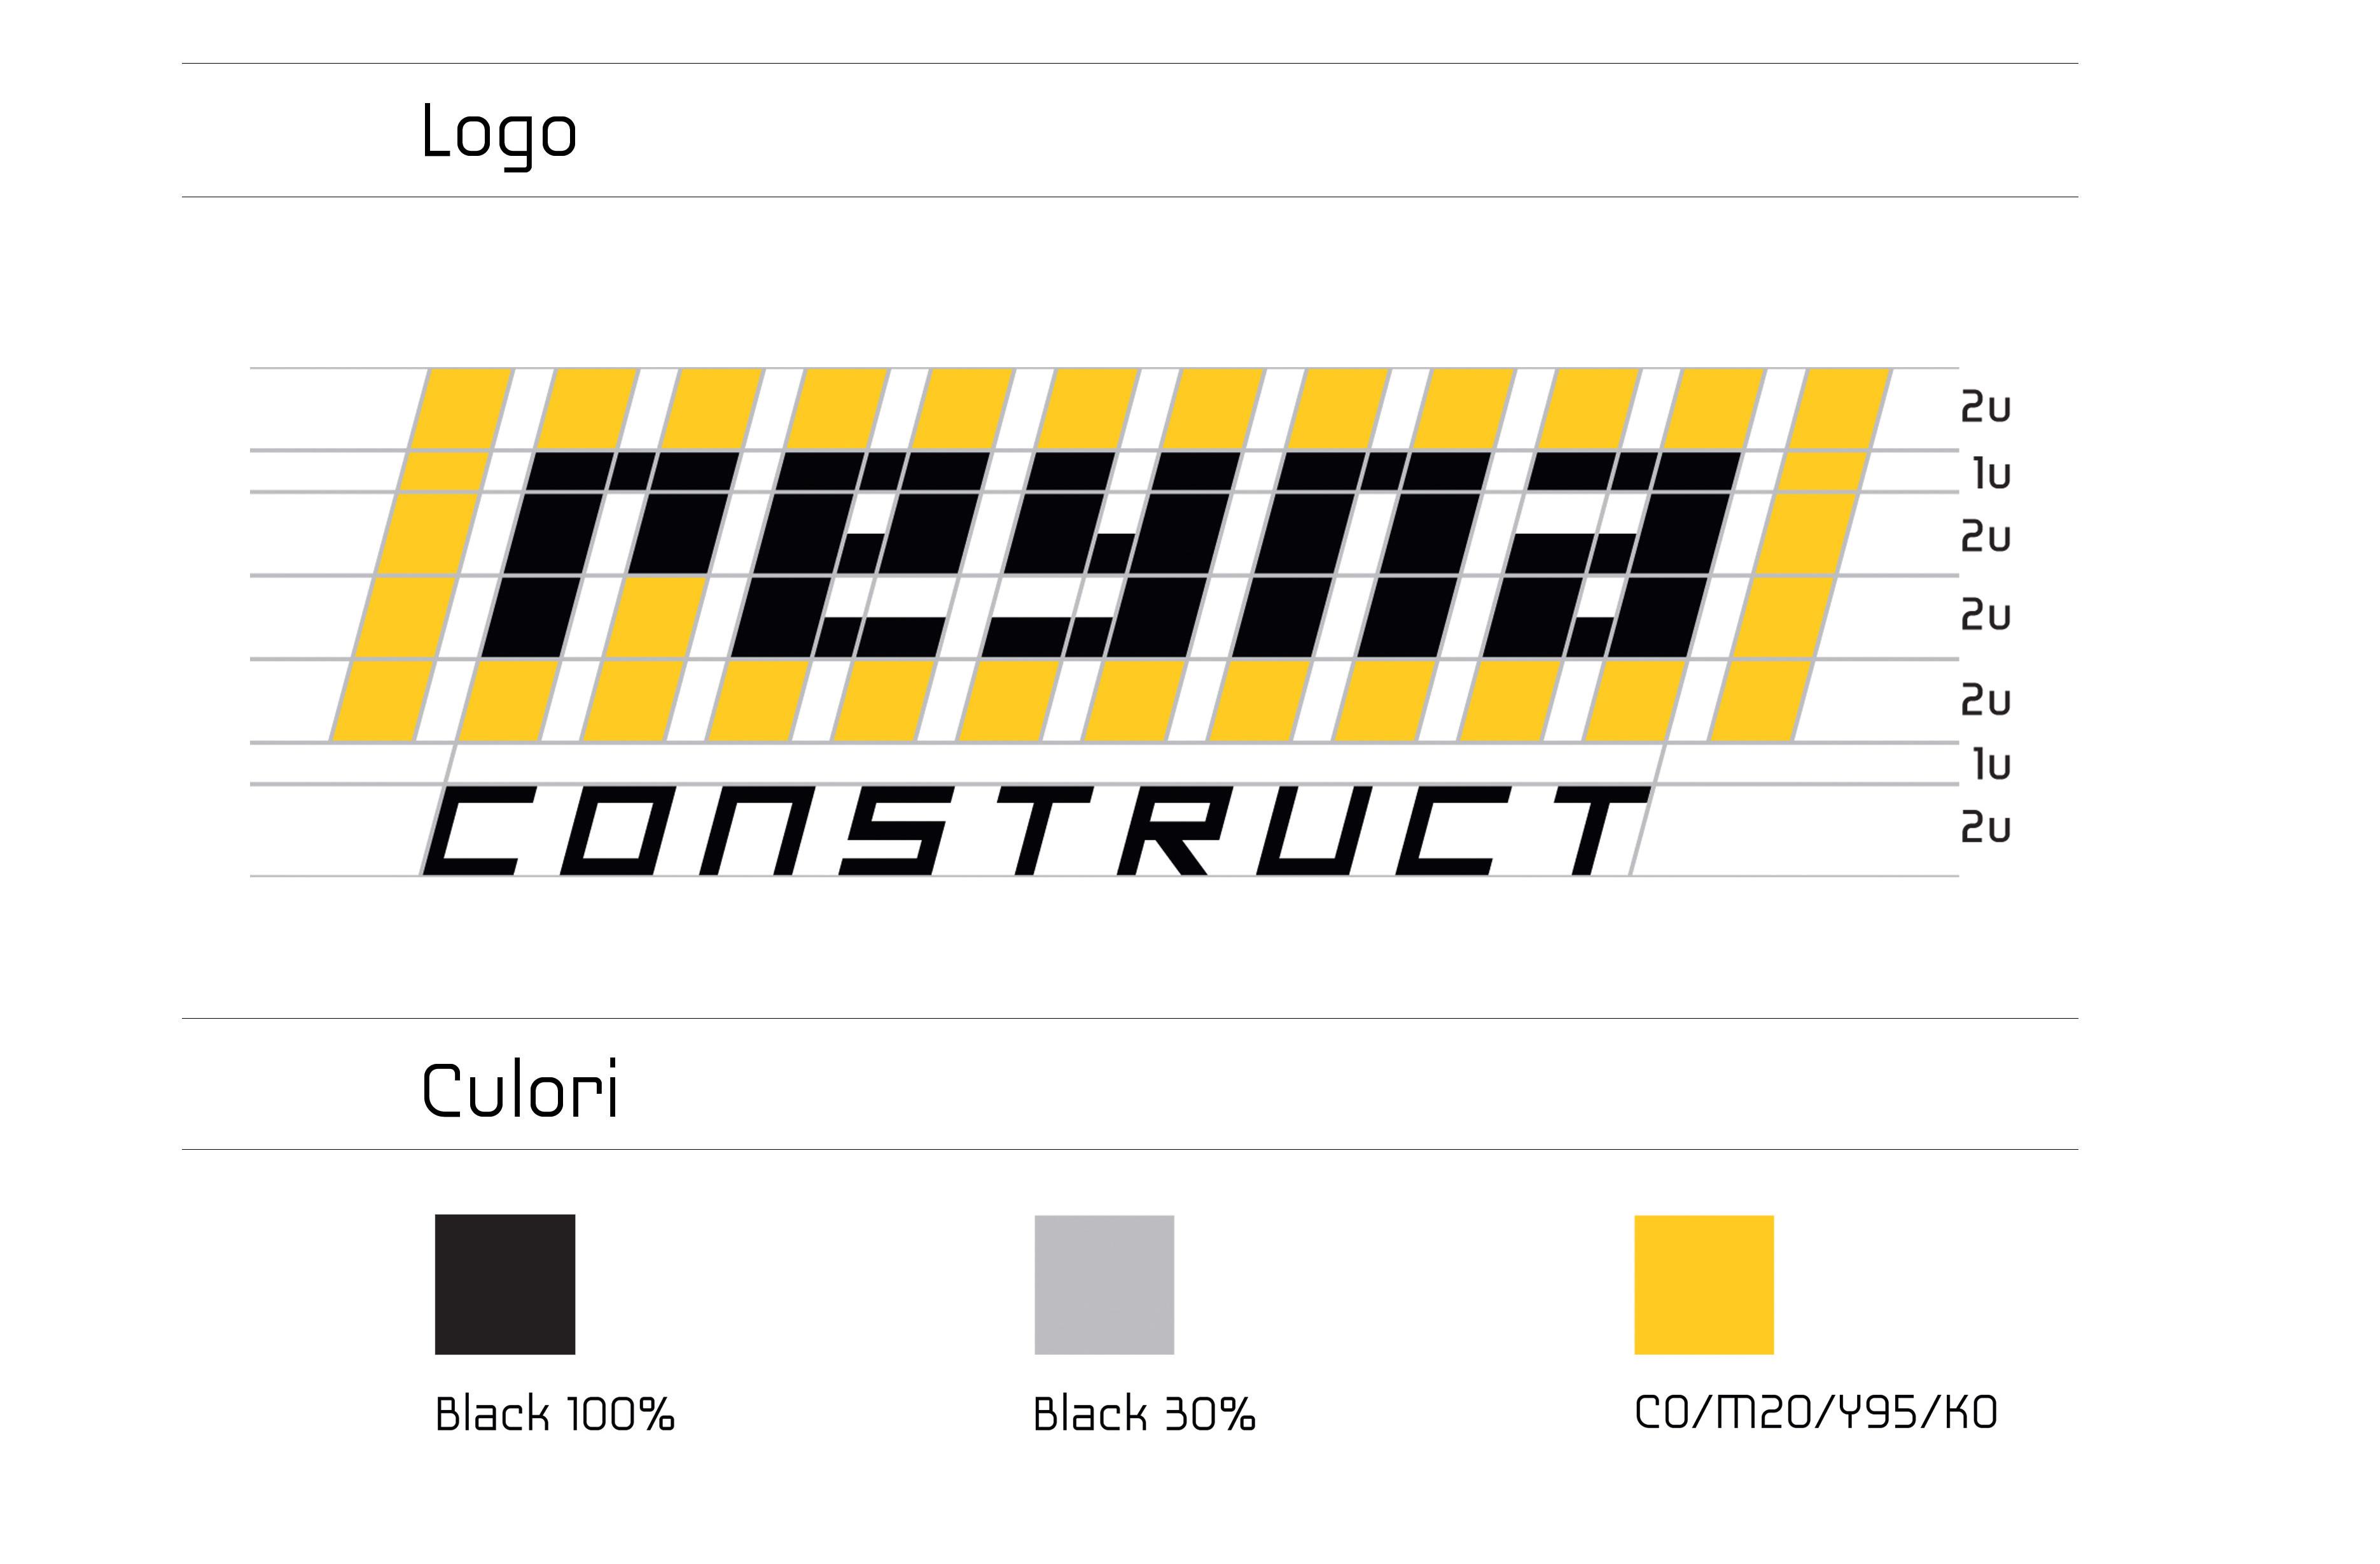 logo_culori